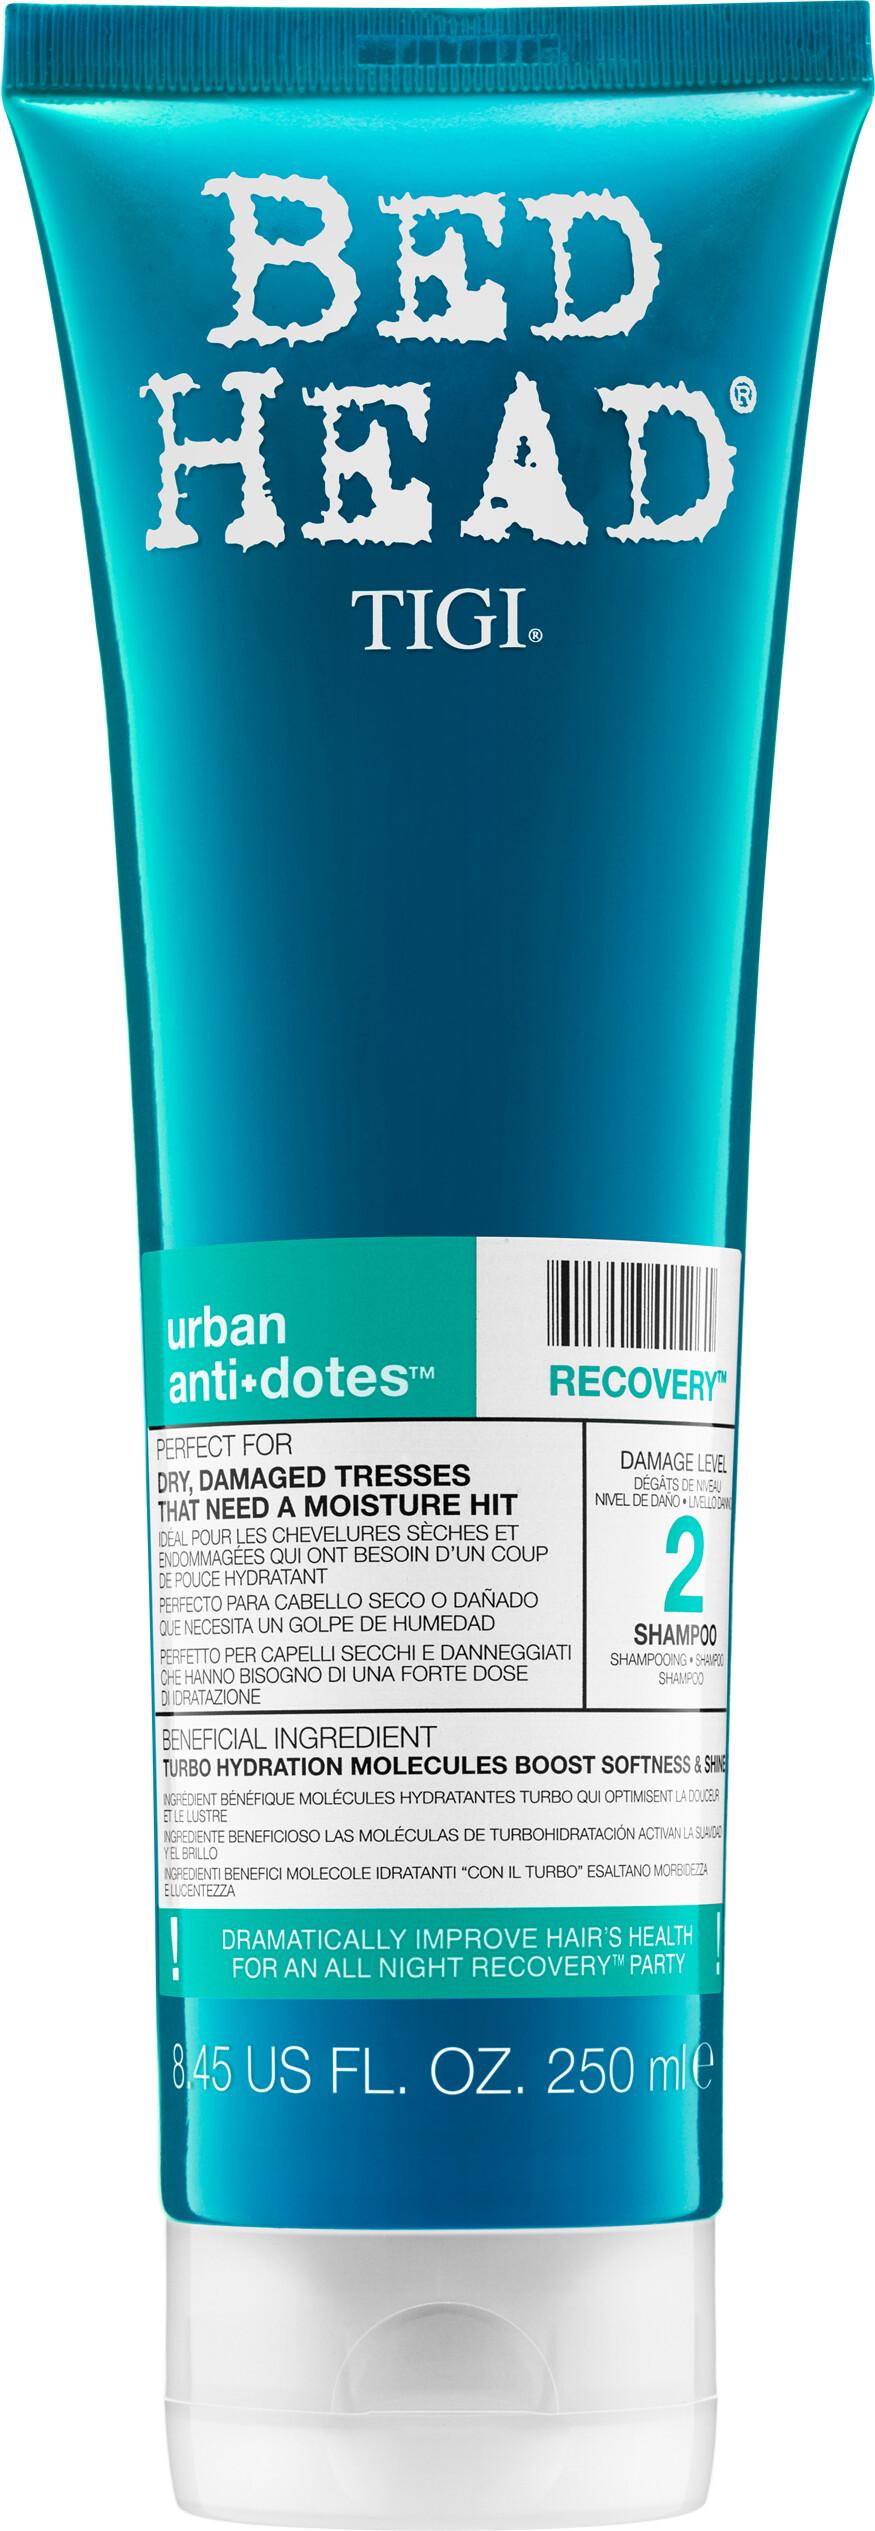 TIGI Bed Head Urban Antidotes 2 Recovery Shampoo 250ml